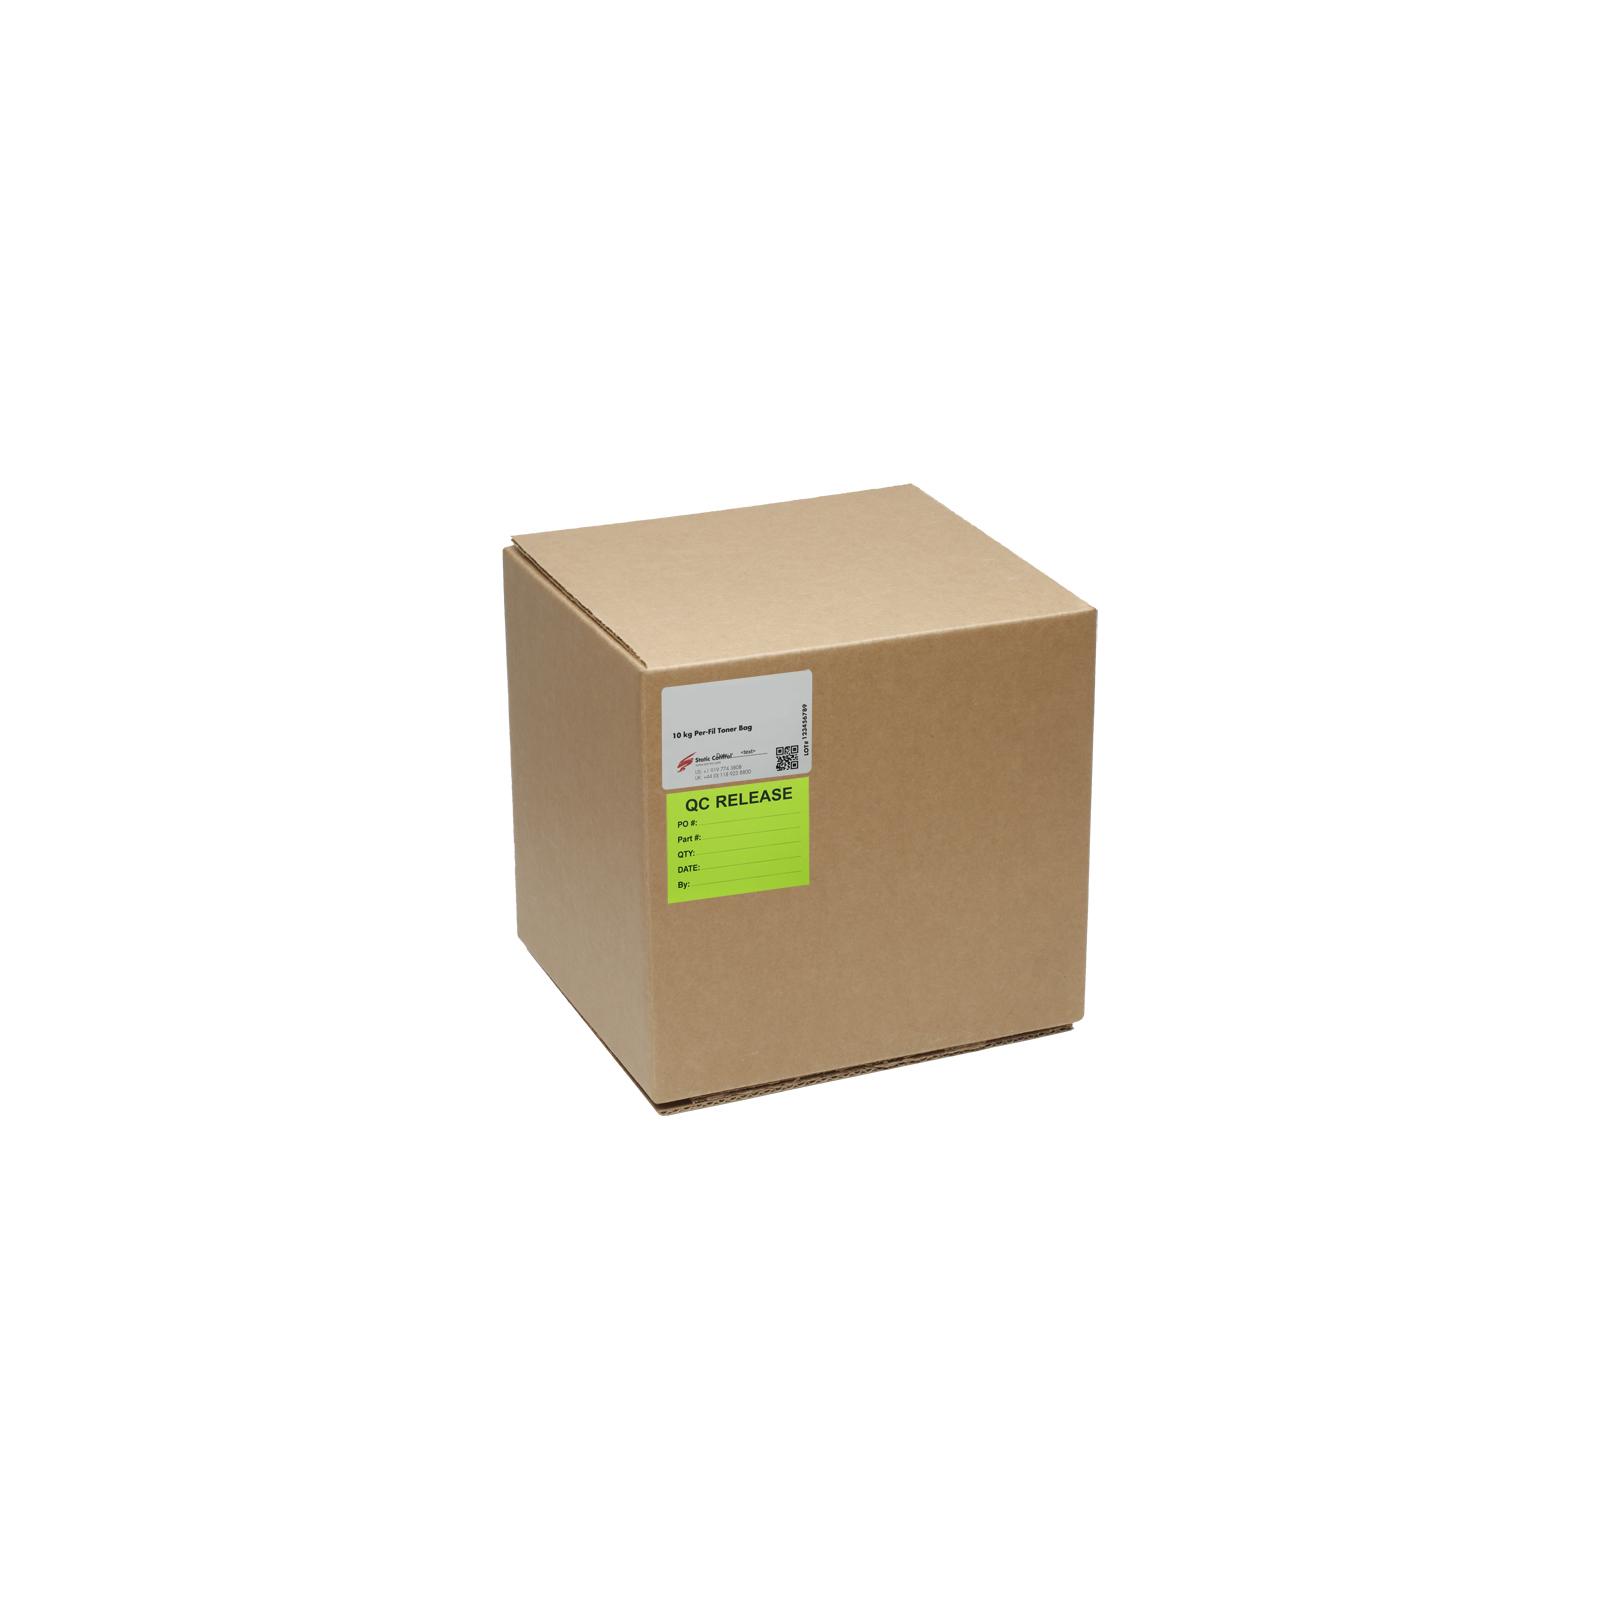 Тонер HP CLJ ProM452 10кг yellow Static Control (HM452-10KG-YOS)